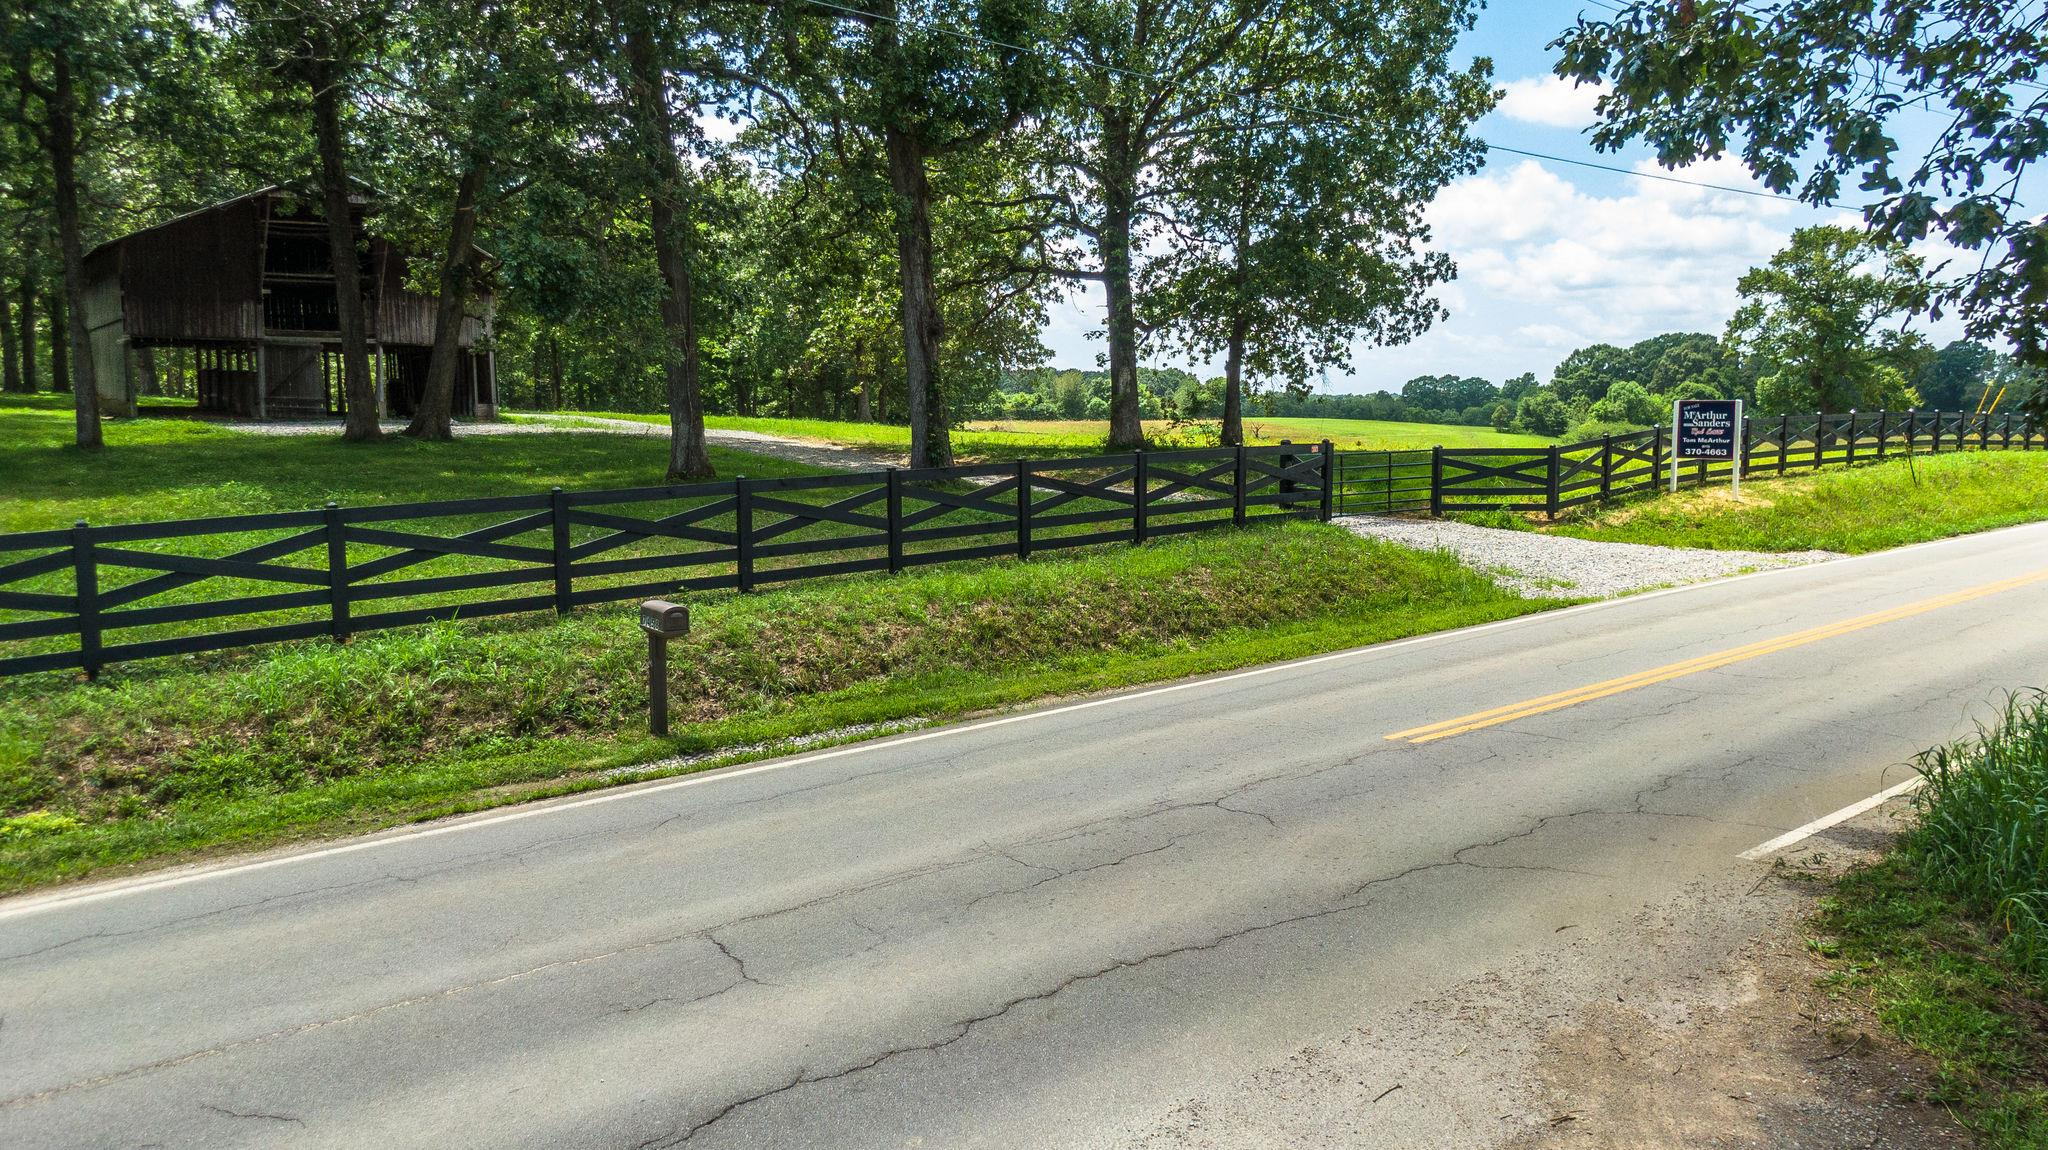 0 Pinewood Rd, Primm Springs, TN 38476 - Primm Springs, TN real estate listing